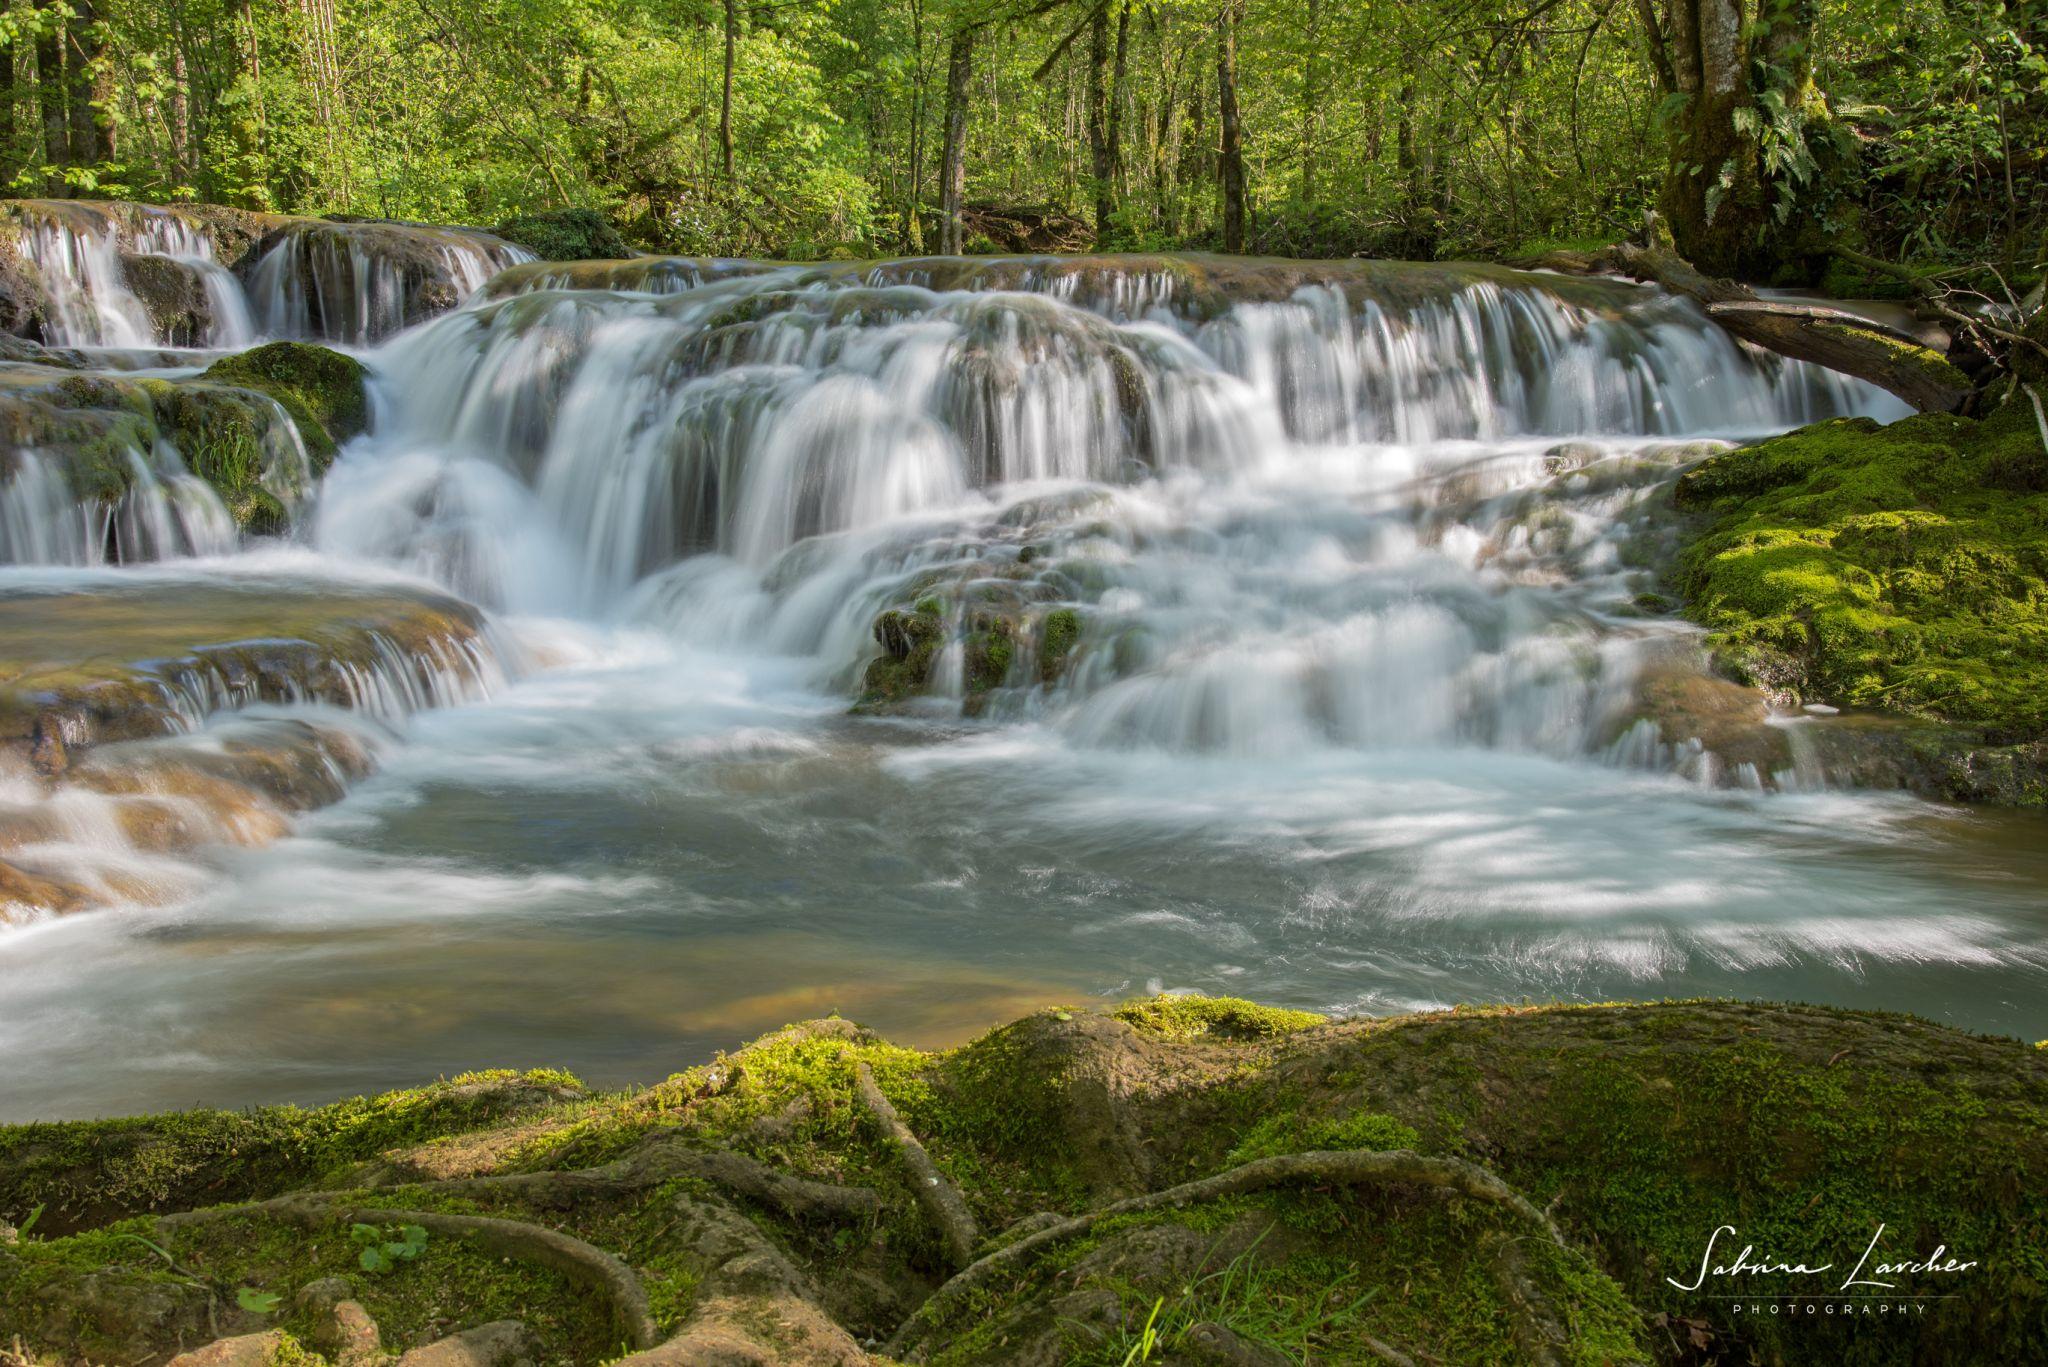 Creek above the Cascade des tufs, France